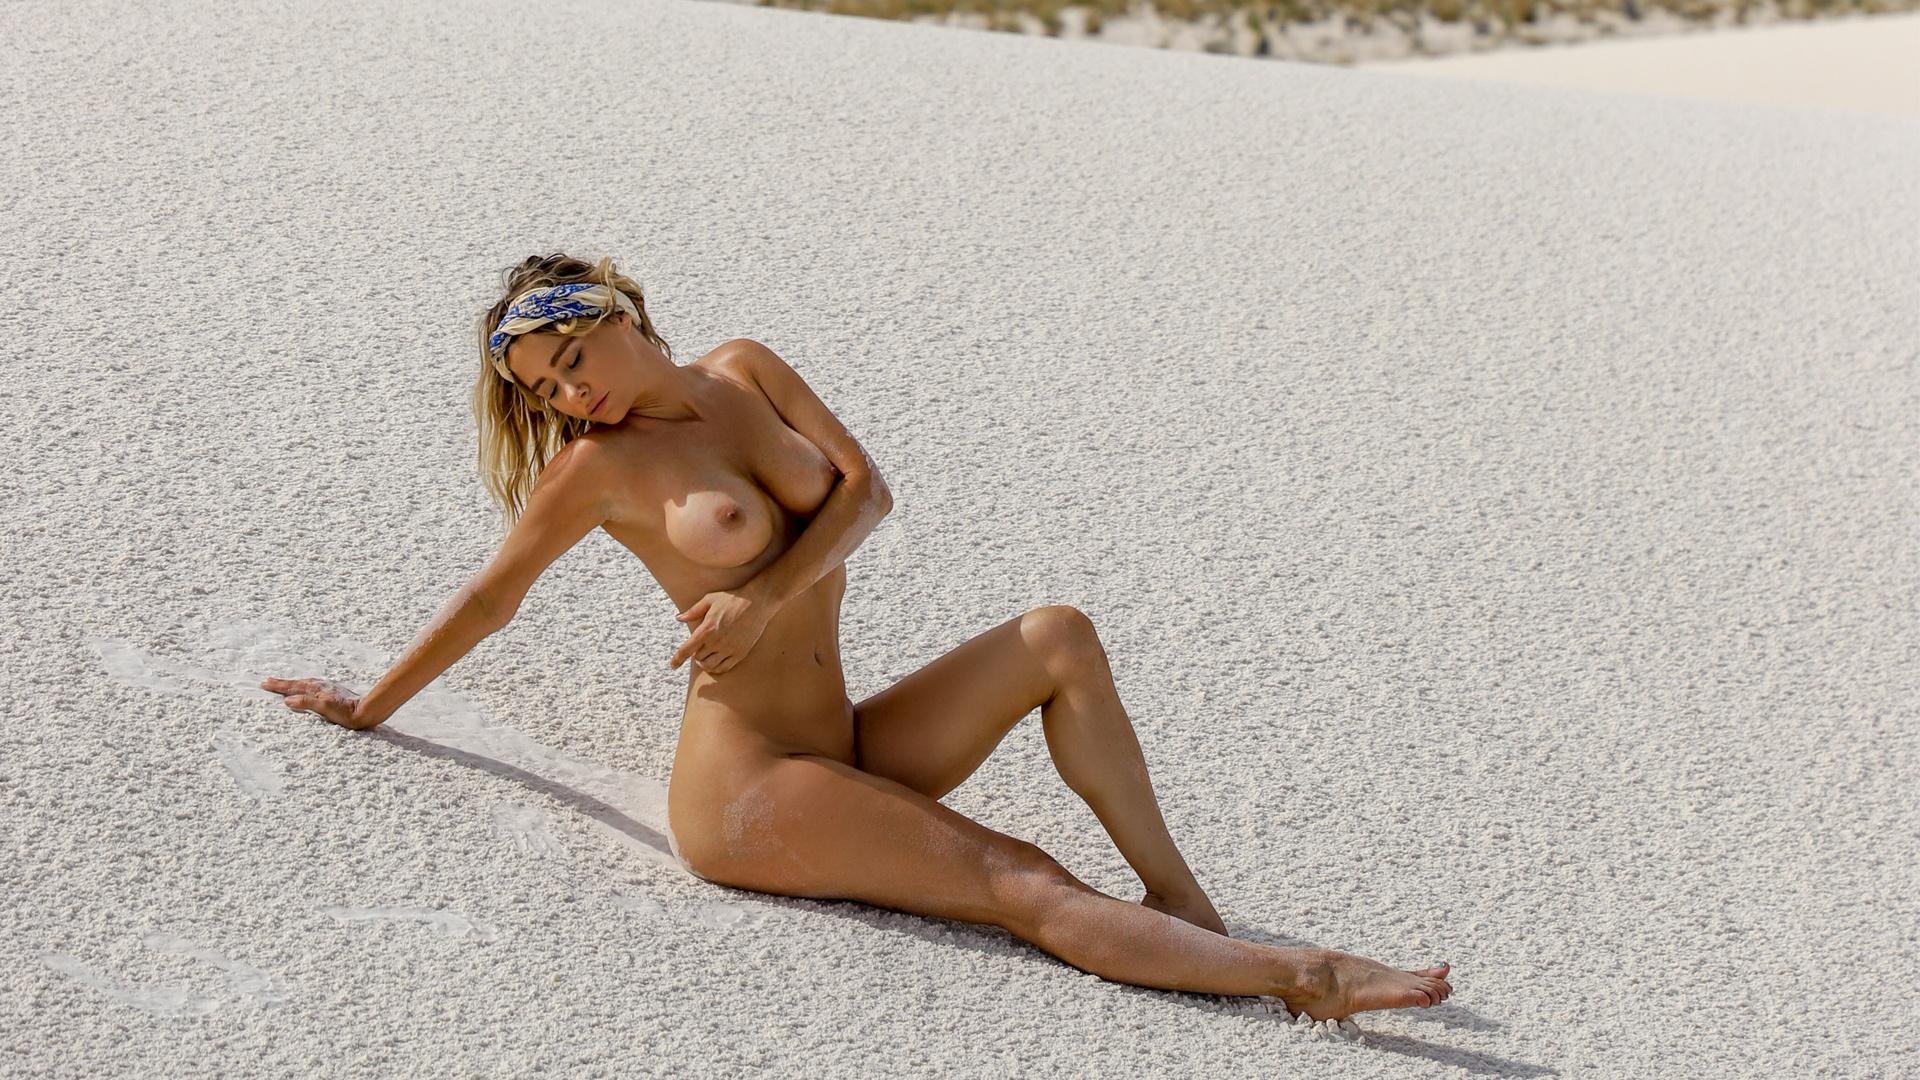 Video Elodie Clouvel nudes (25 photo), Ass, Fappening, Selfie, butt 2015